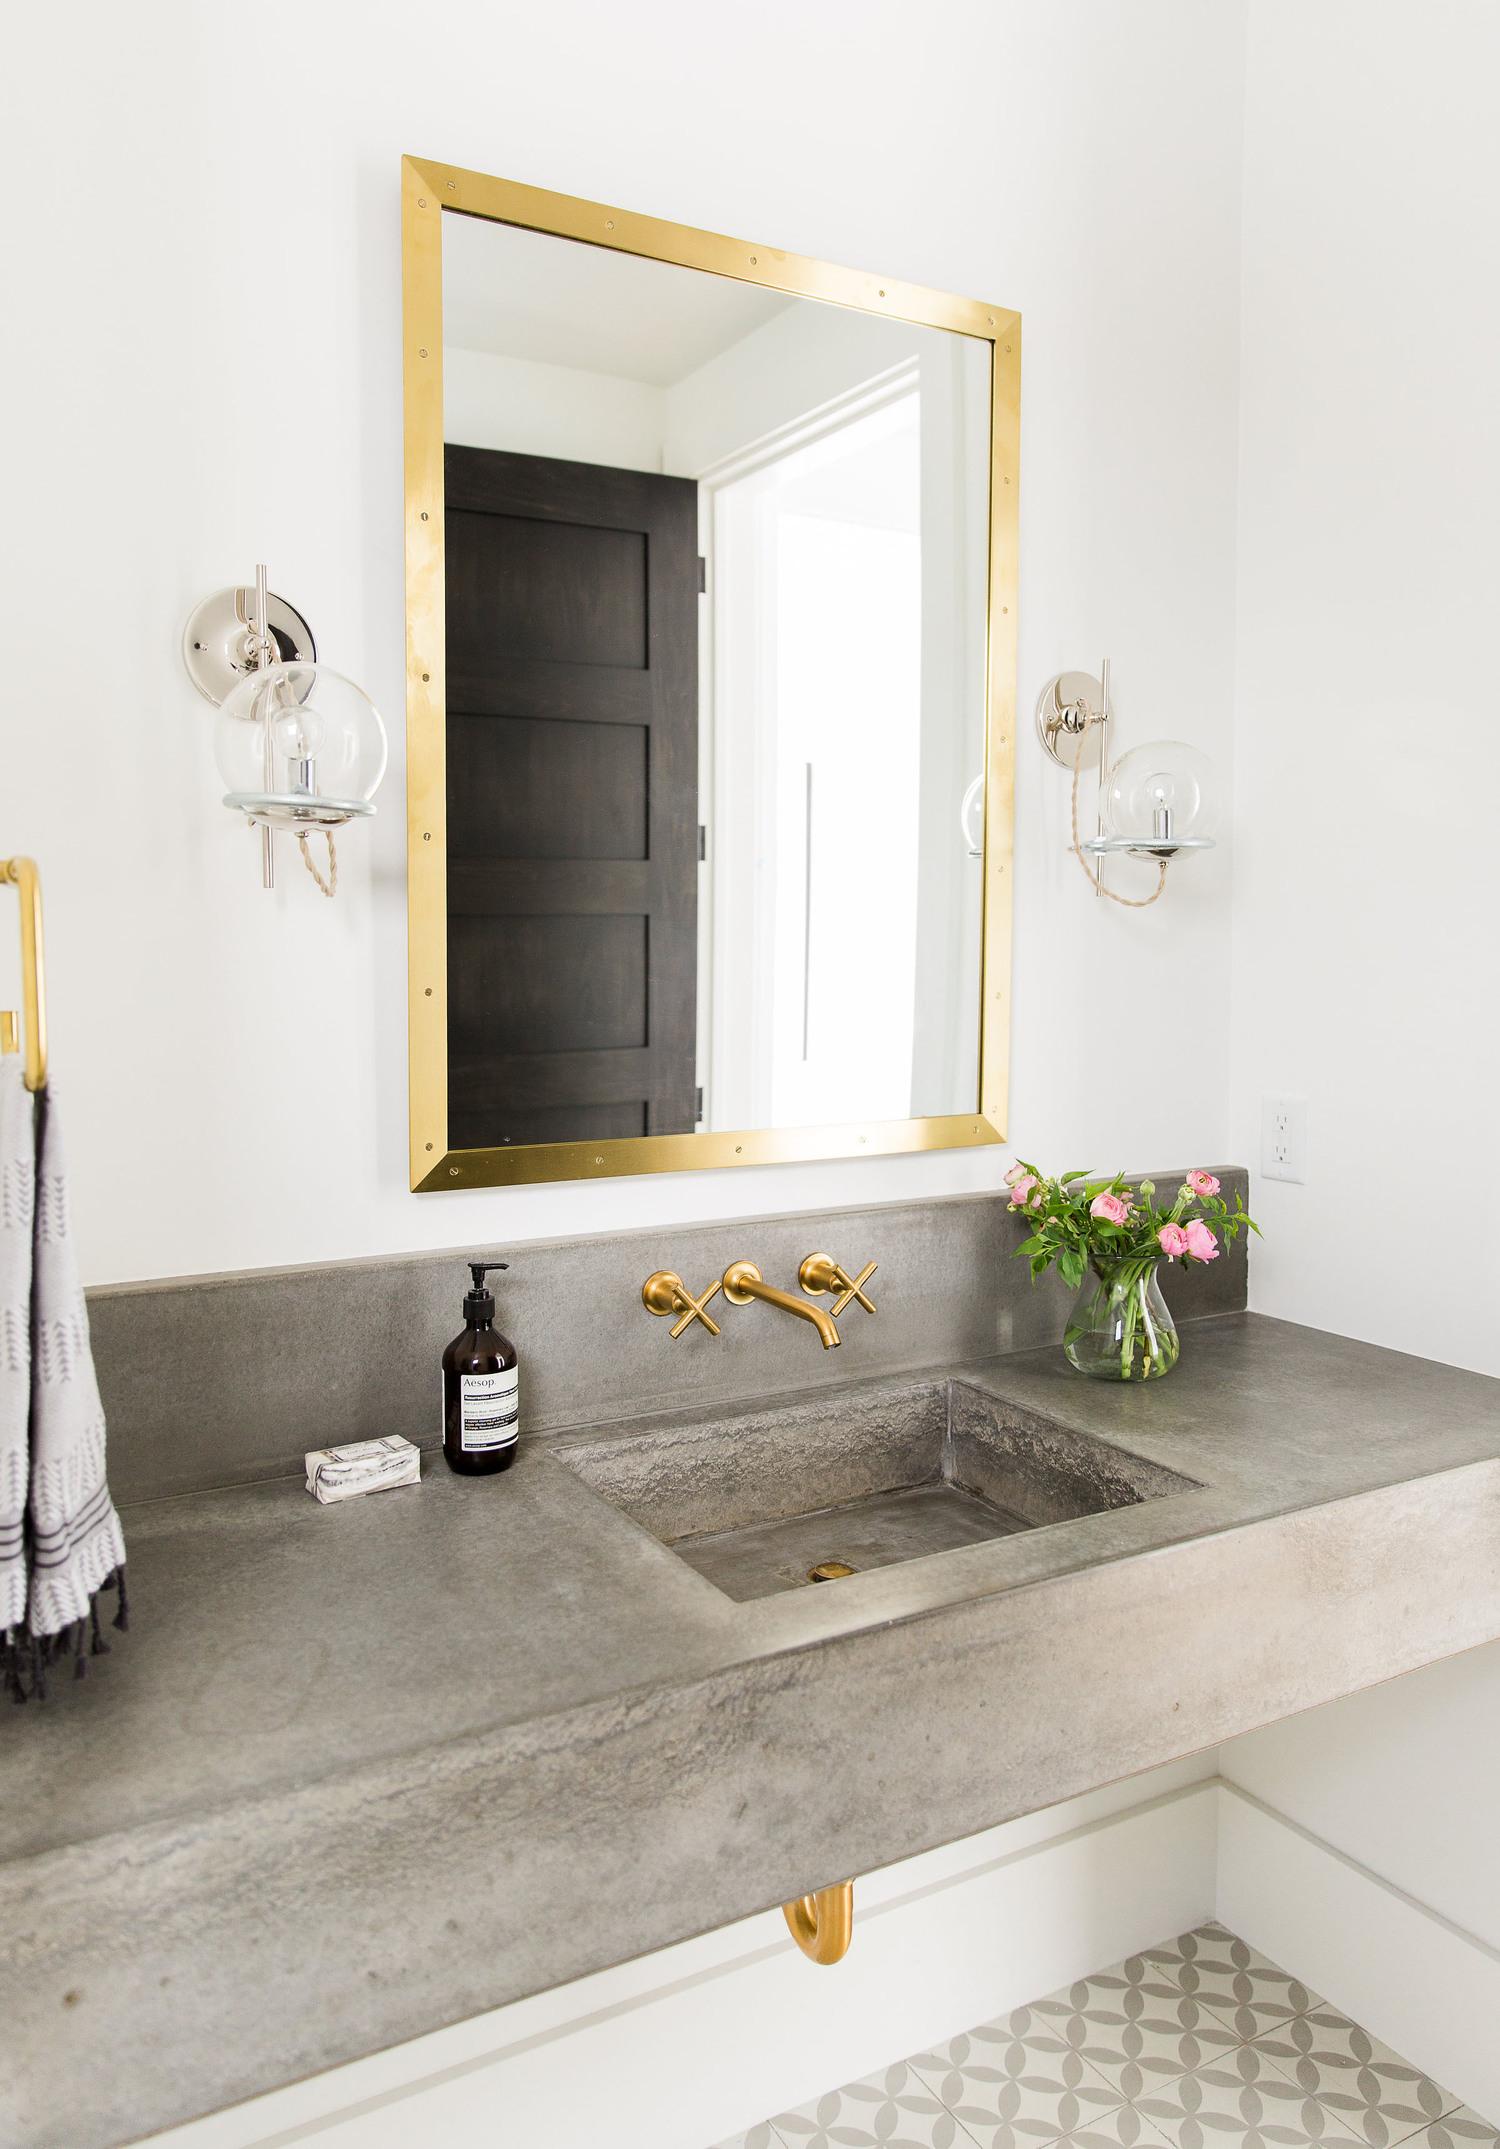 Gold framed mirror above bathroom sink